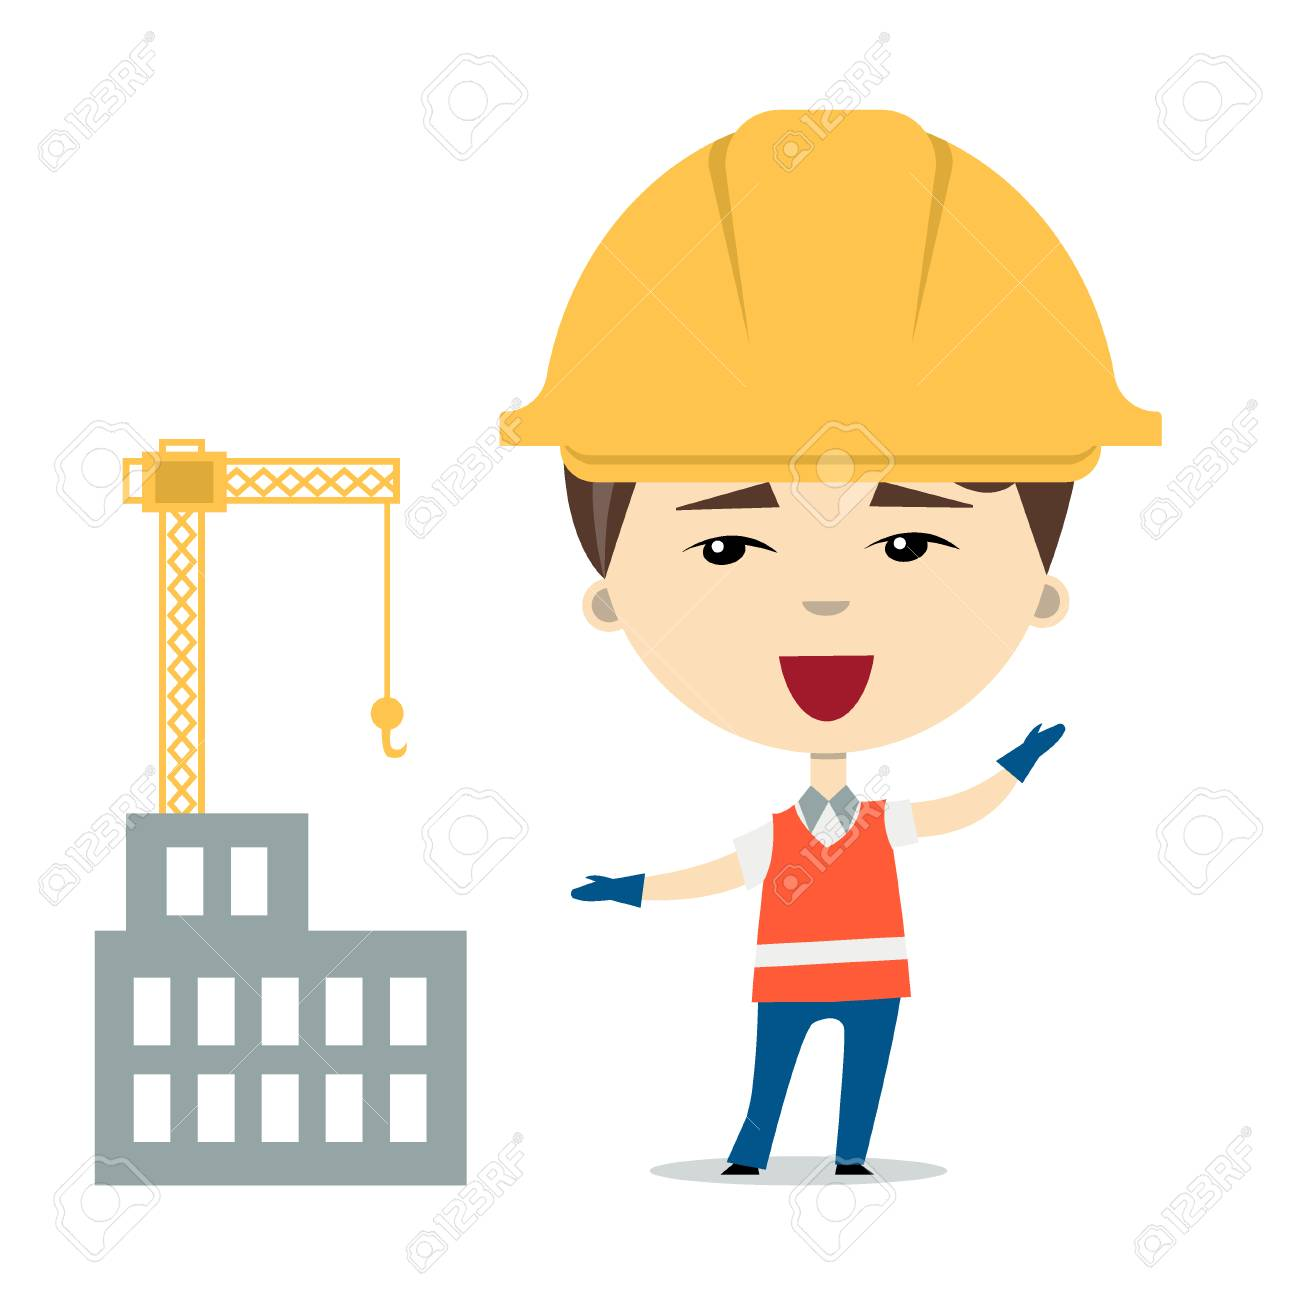 Flatvector Illustration Of Funny Cartoon Worker Or Constructor